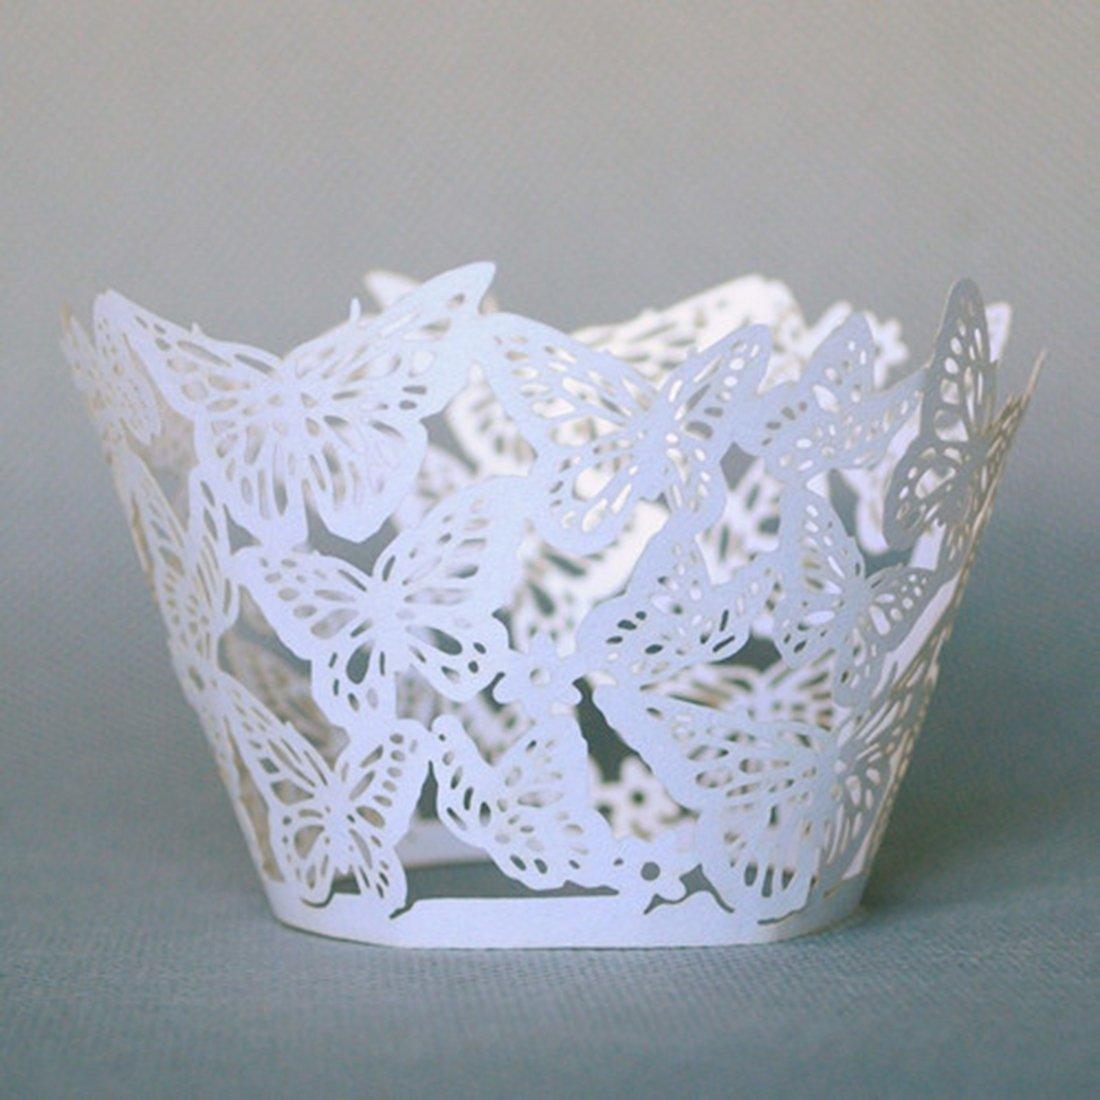 joyliveCY 12st Wolke Design Style Pearly Papier Vine Spitze Cup Cake Wrappers Dekoration Joyshop